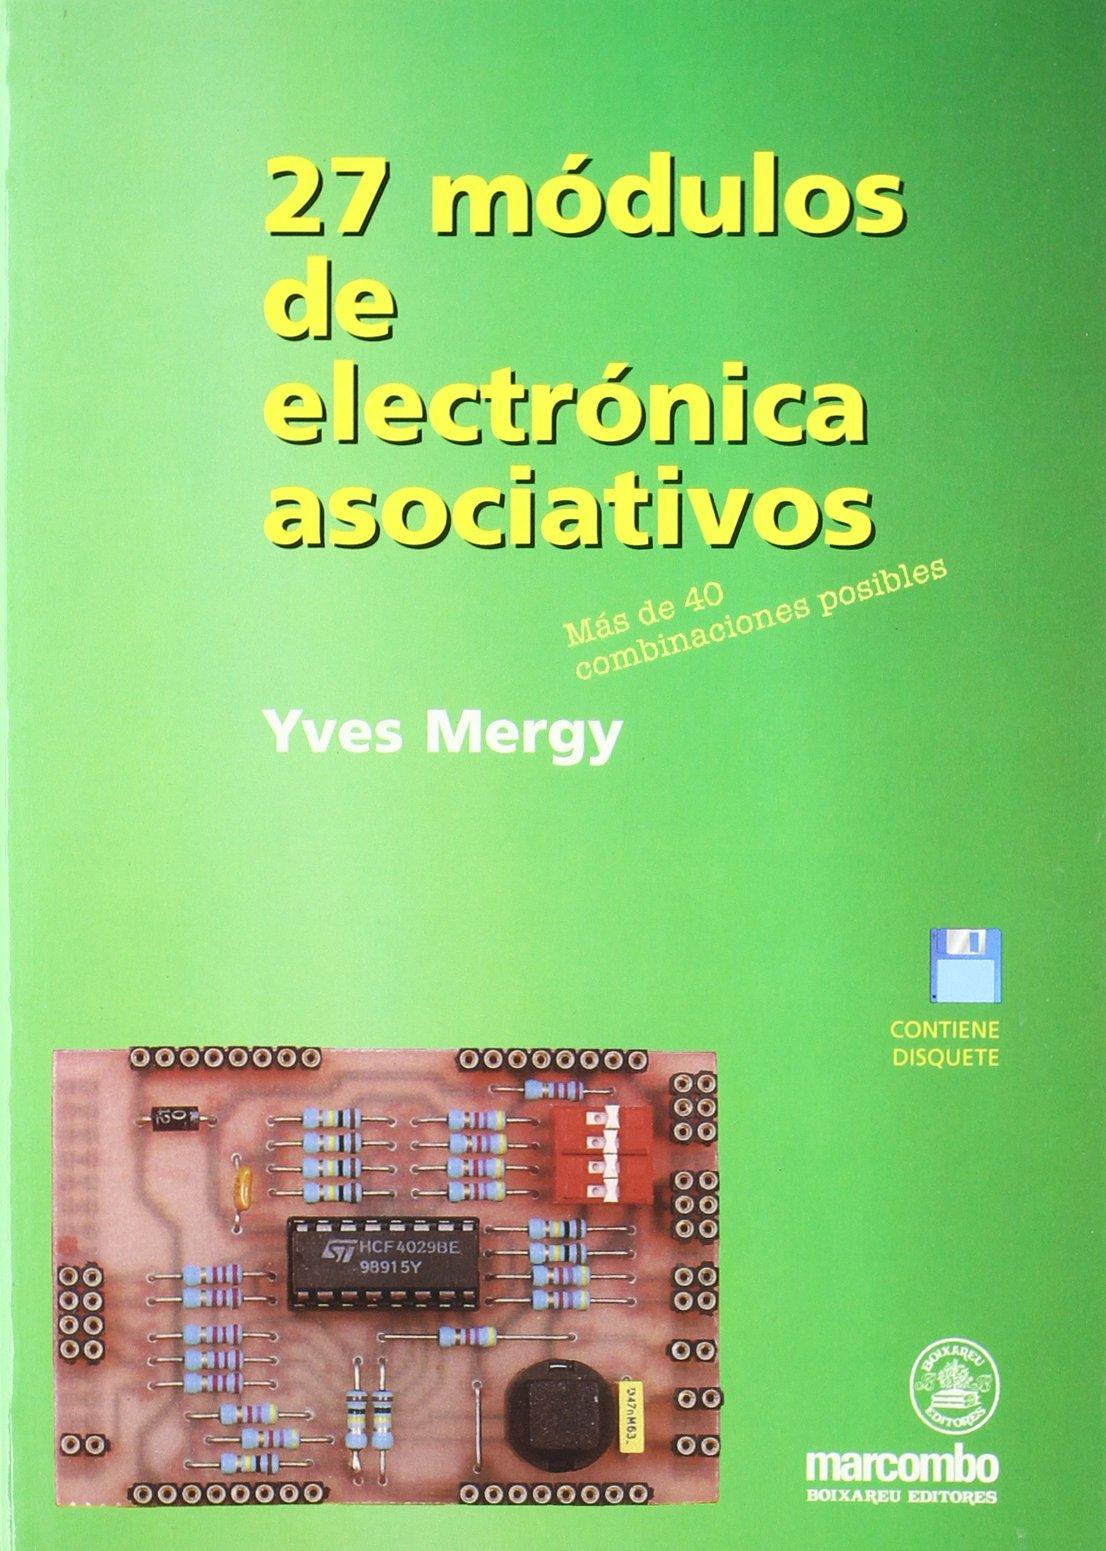 27 Modulos de Electronica Asociativos (Spanish Edition) (Spanish) Paperback – October, 1999